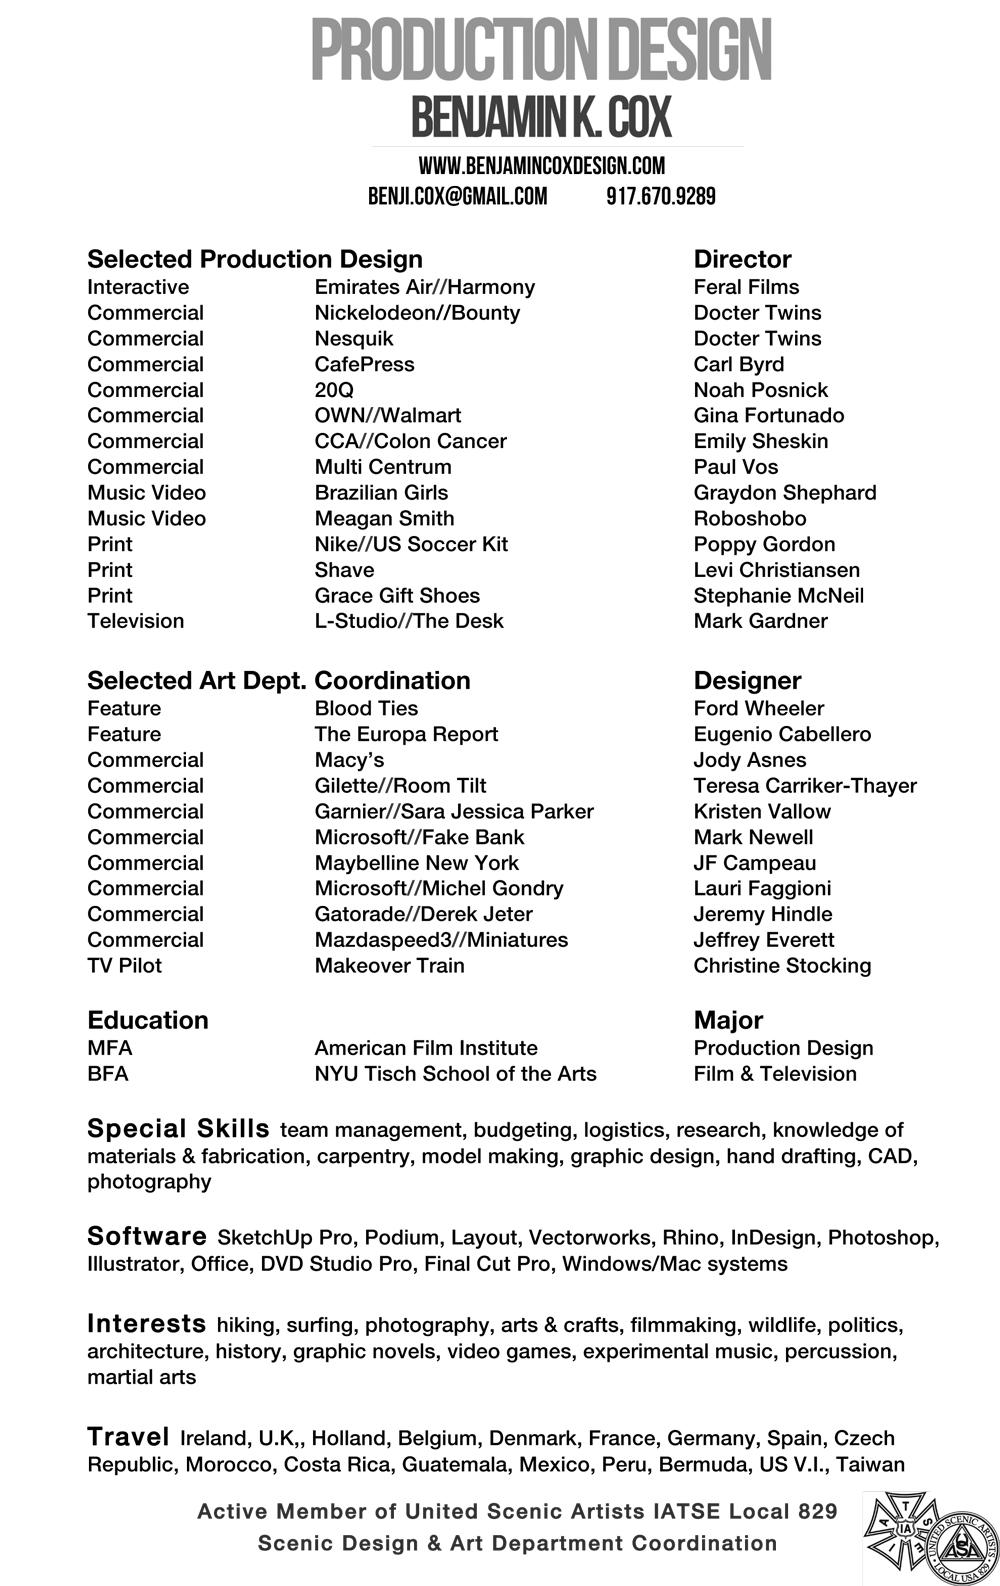 Resume Benjamin K Cox Production Design